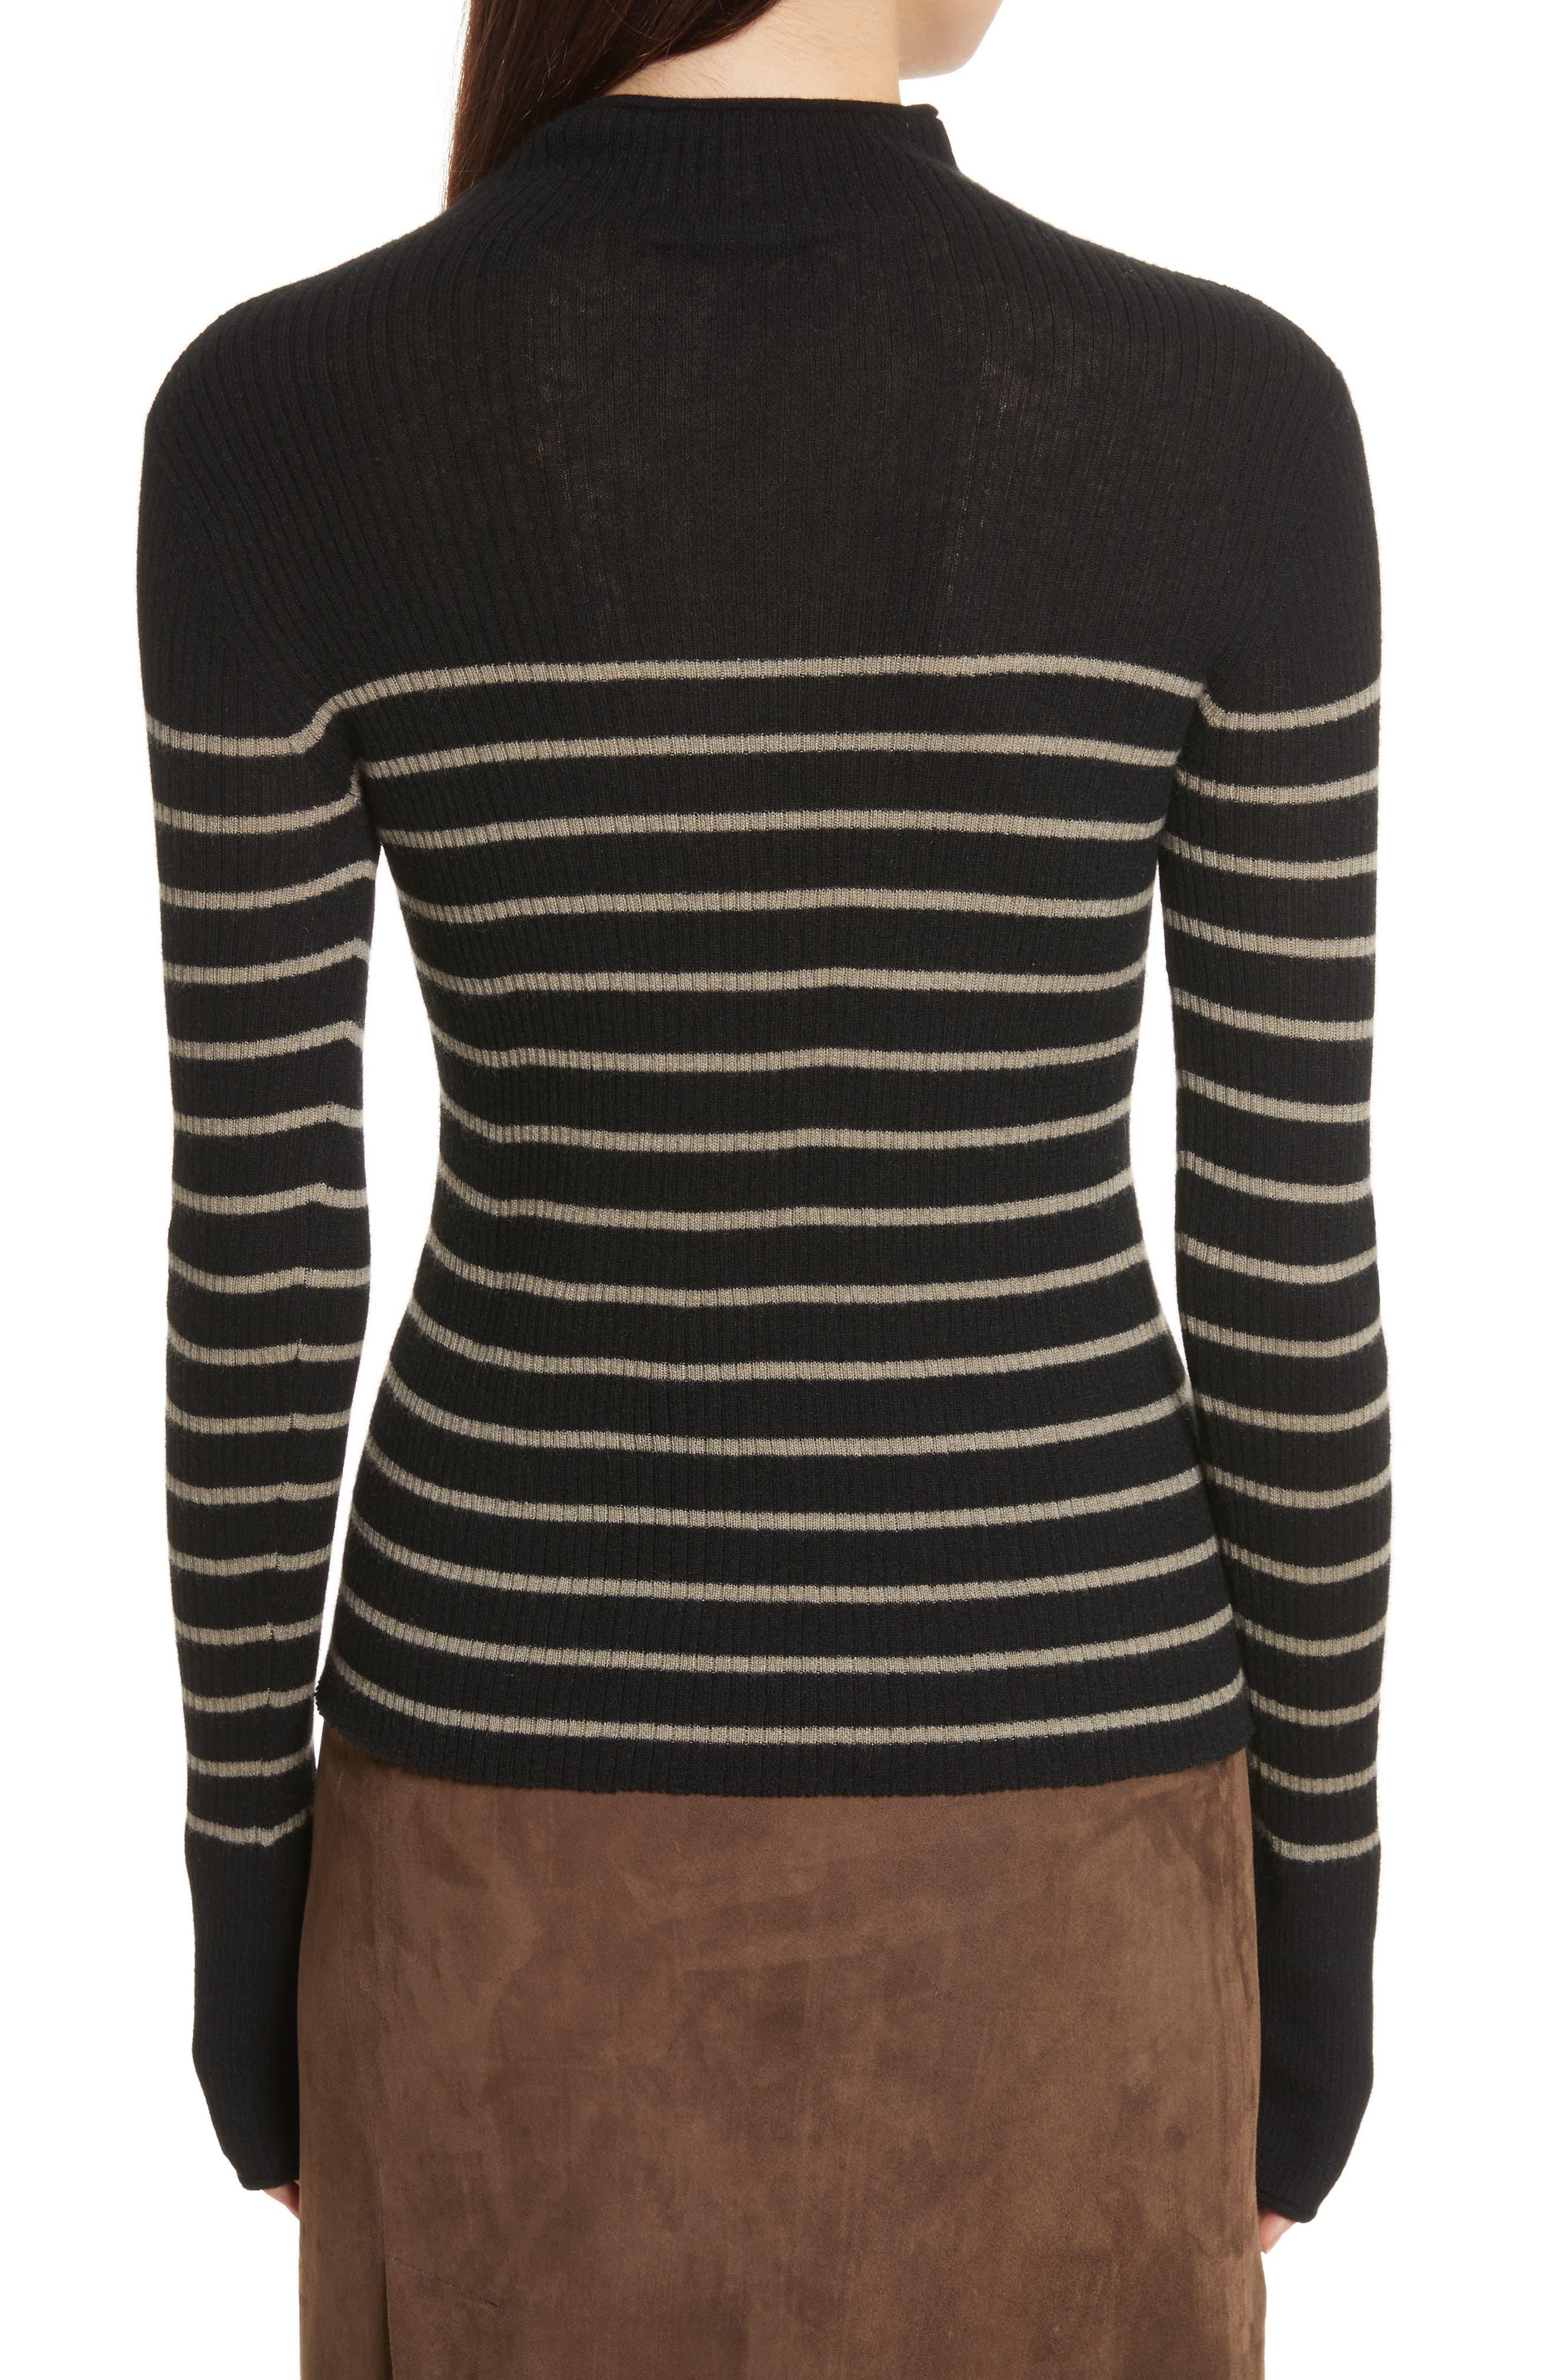 Stripe Ribbed Cashmere Sweater,                             Alternate thumbnail 2, color,                             Black/ Pebble Taupe